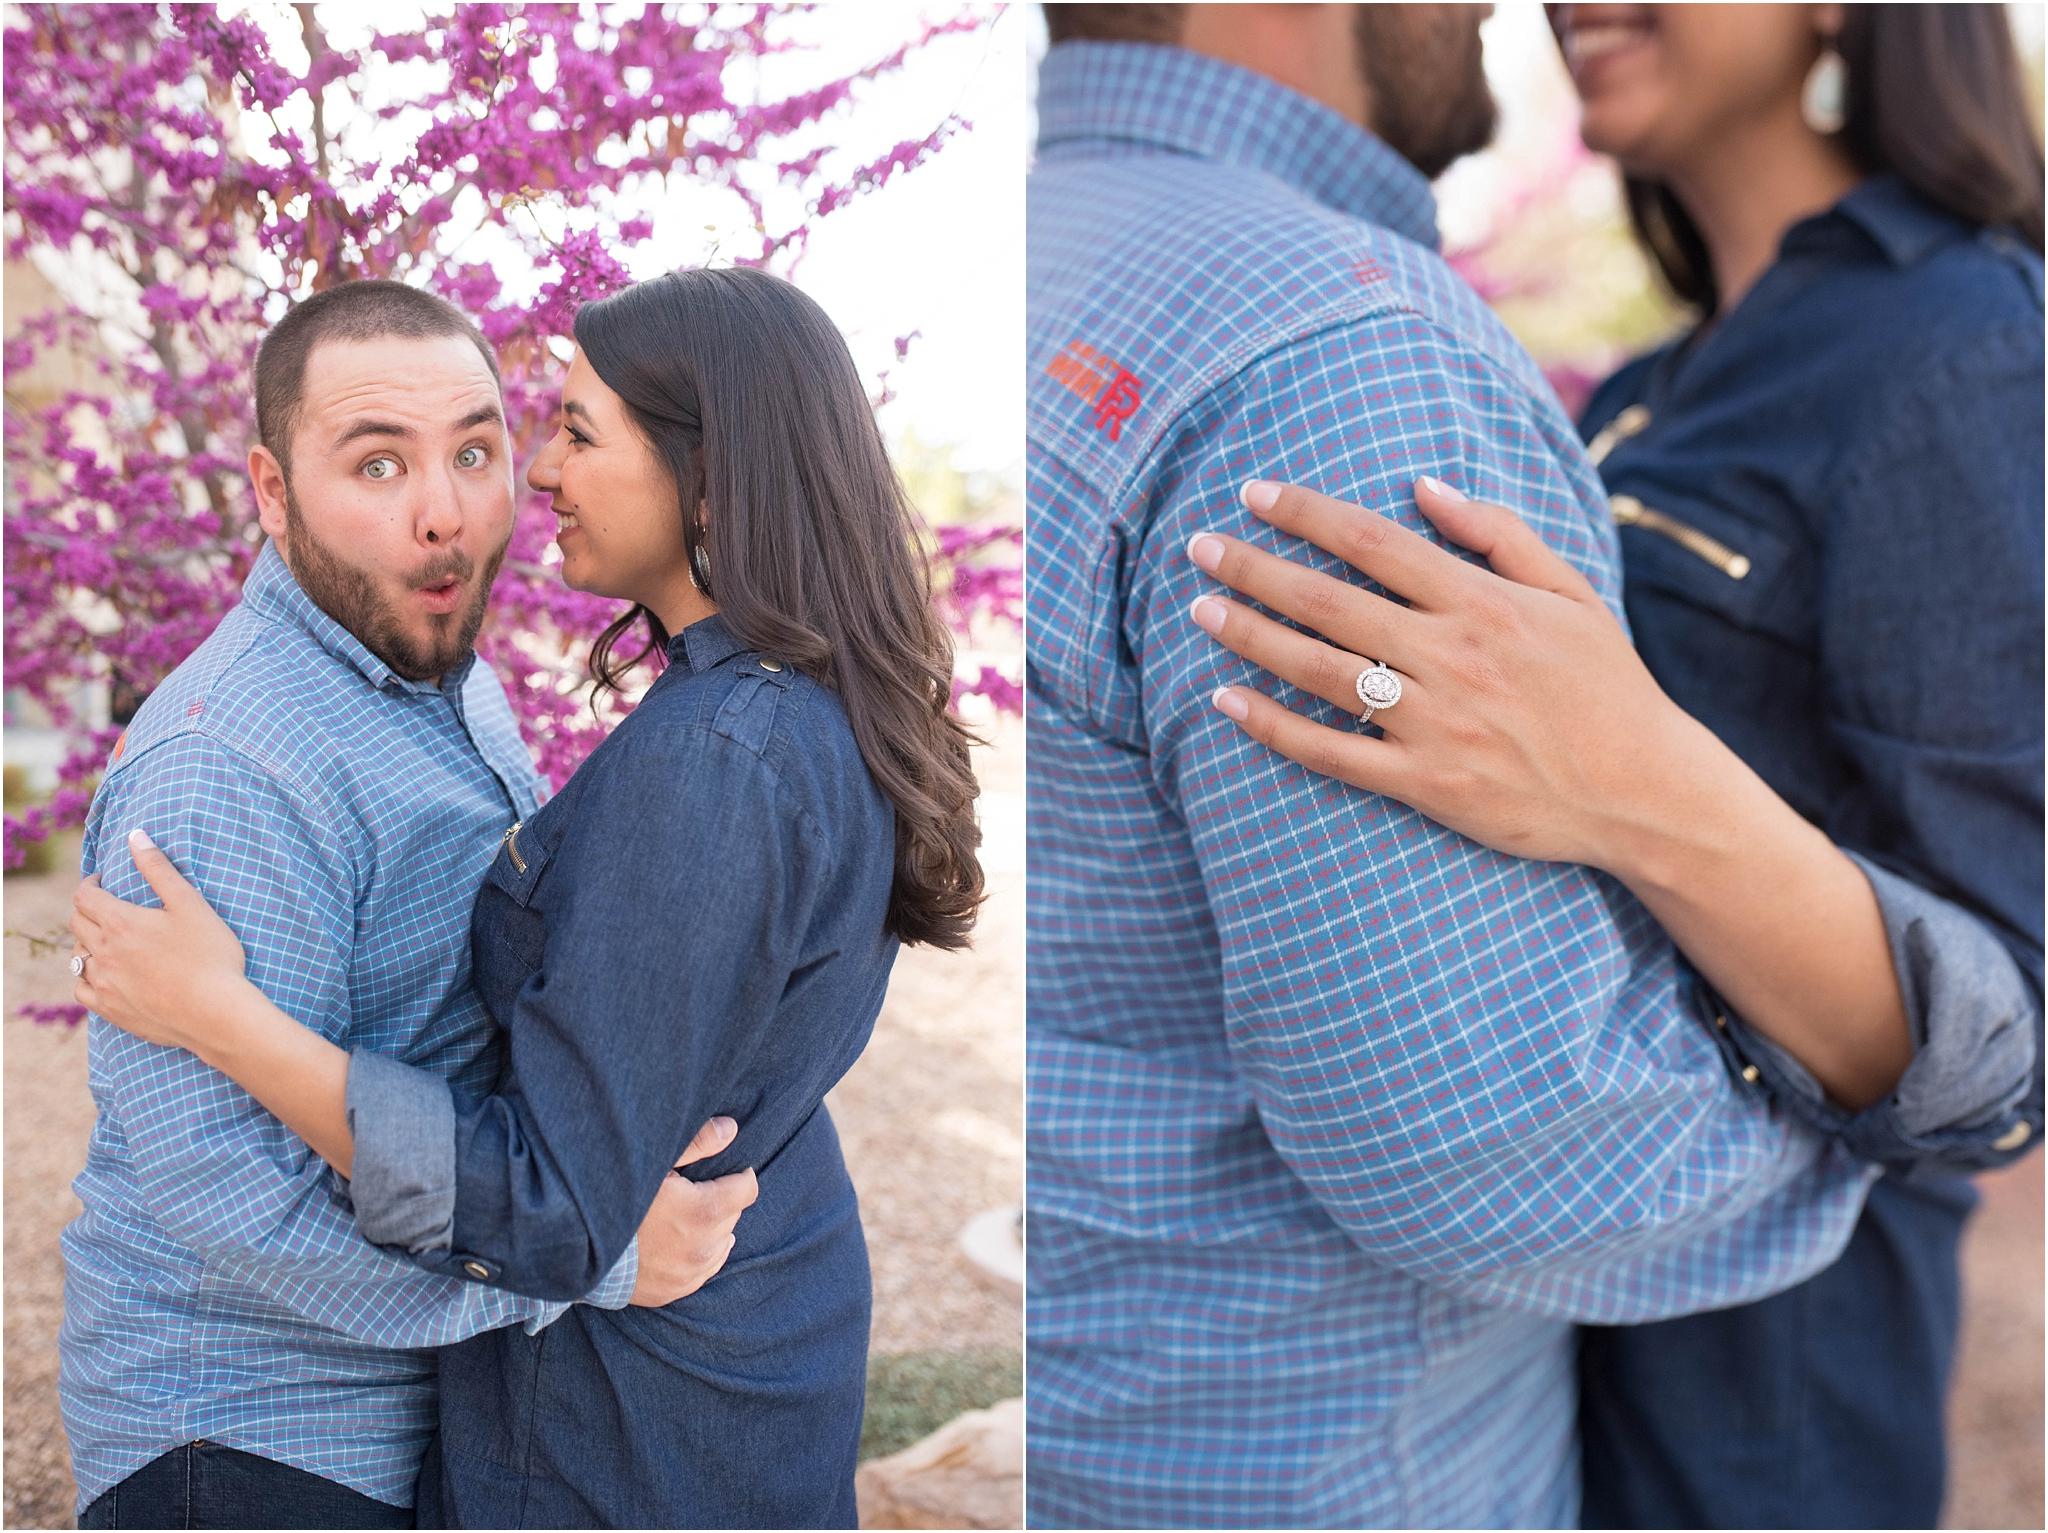 kayla kitts photography-matthew-azaira-engagement-new mexico-belize-wedding-photographer_0018.jpg